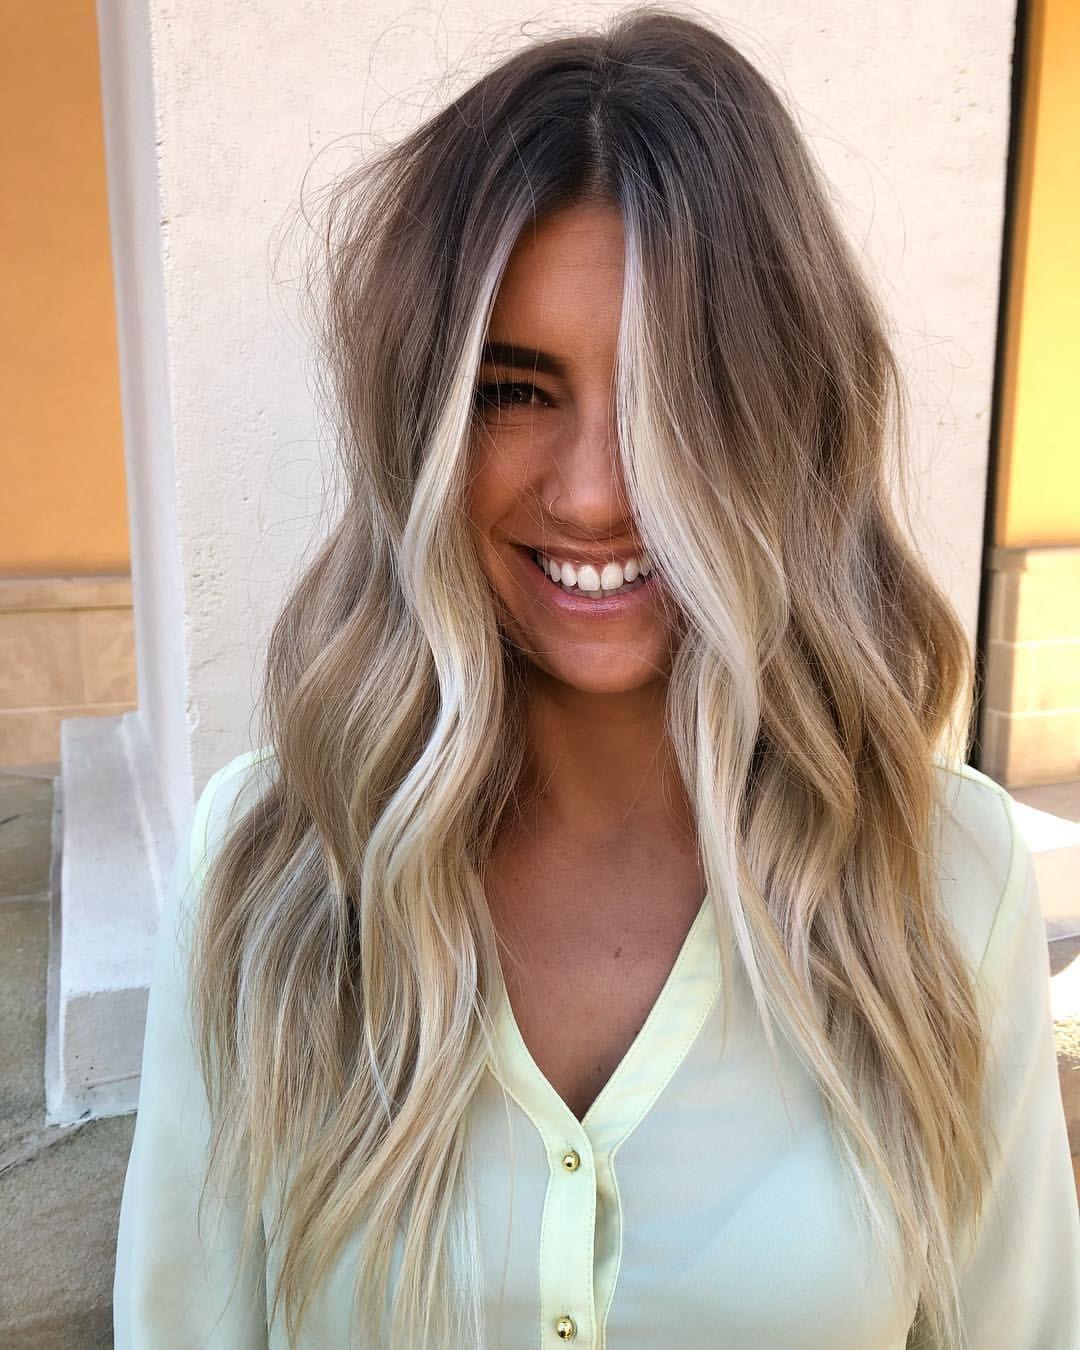 Beige Baby #colormelt #balayage #blondehair #livedincolor #livedinblonde #behindthechair #level10babe #level10blonde